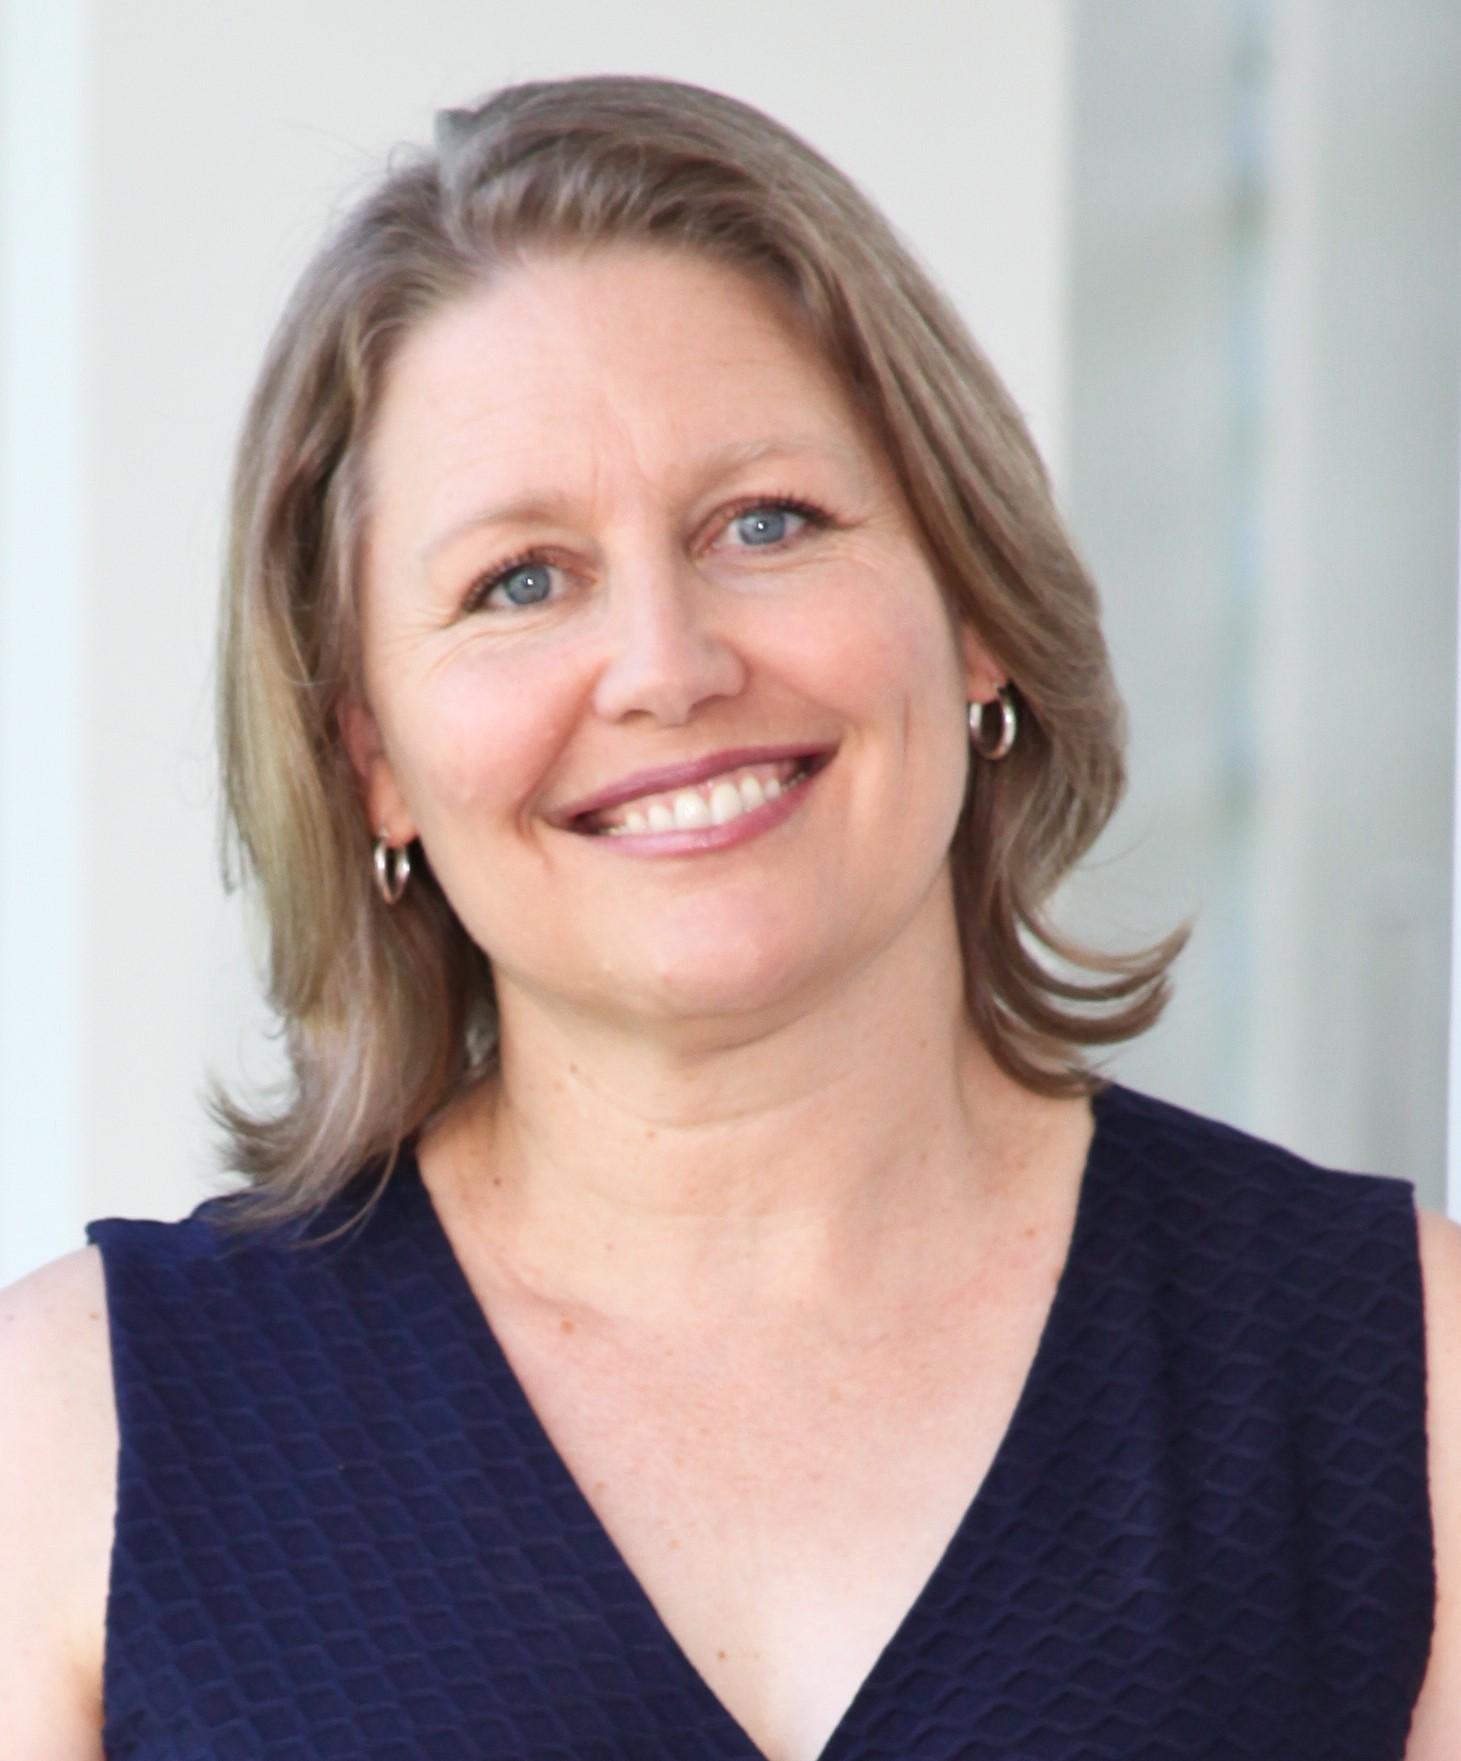 Amy Lassen